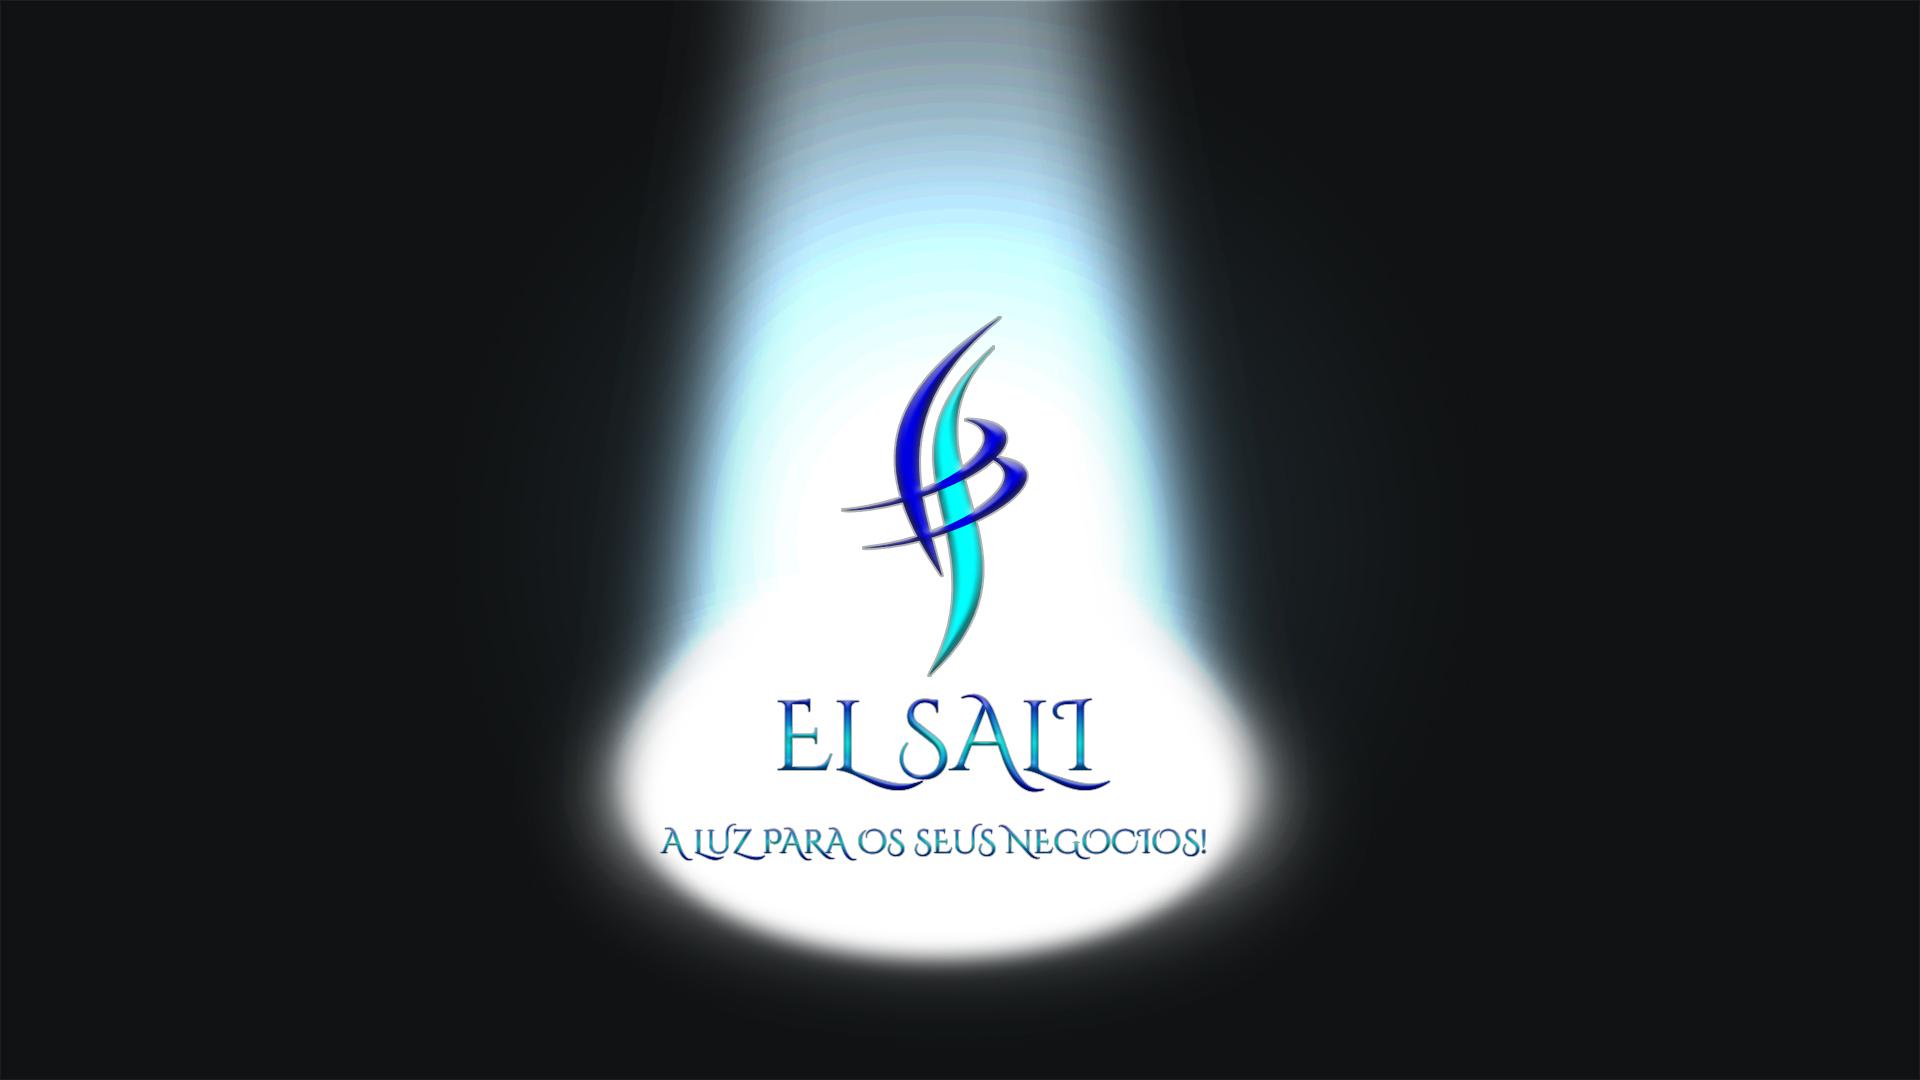 Logotipo_400dpi_Vertical_Background_FullHD